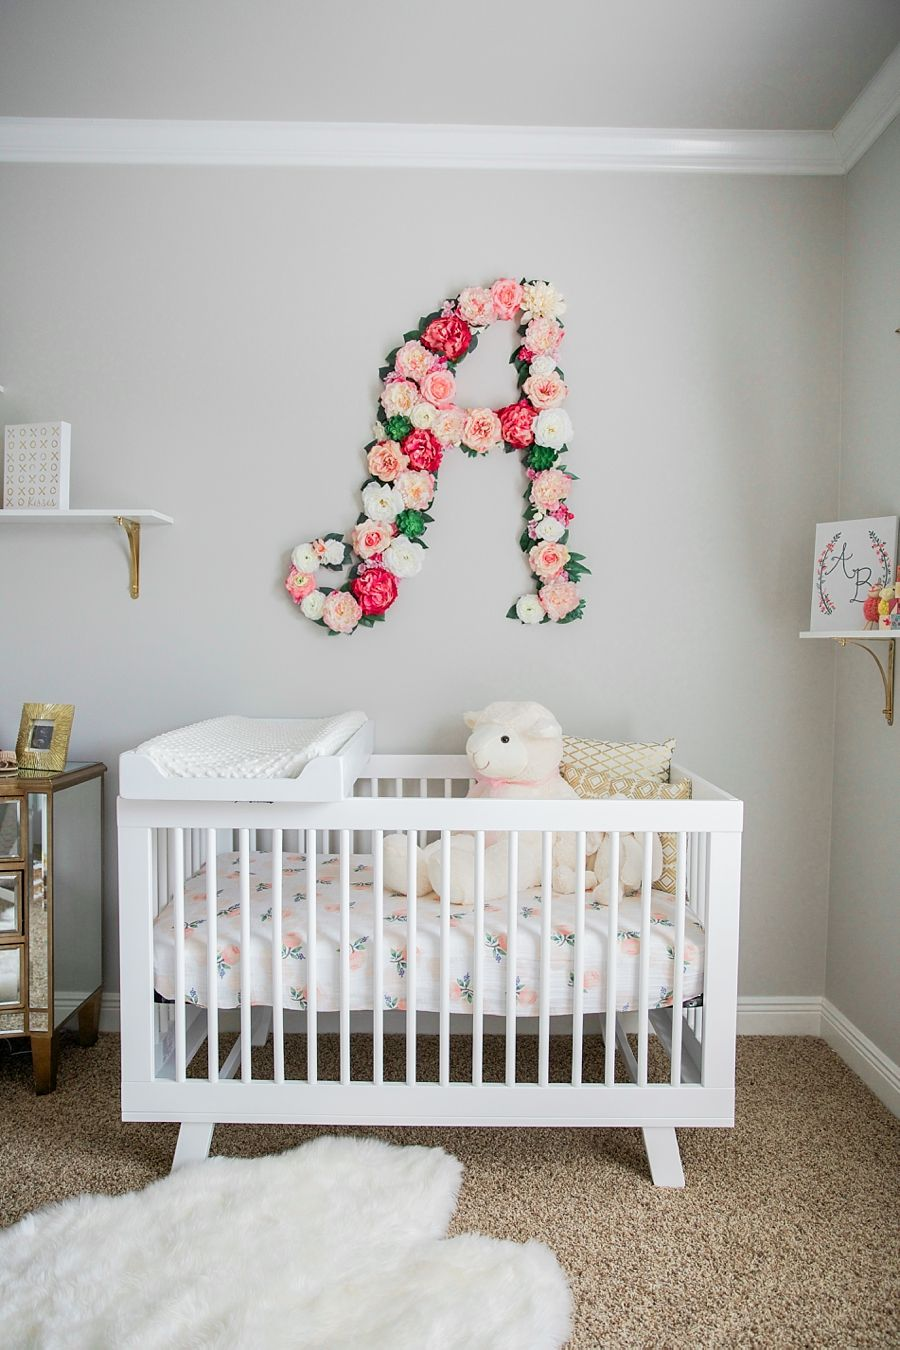 Baby Bailey S Nursery Baby Room Themes Baby Girl Bedroom Baby